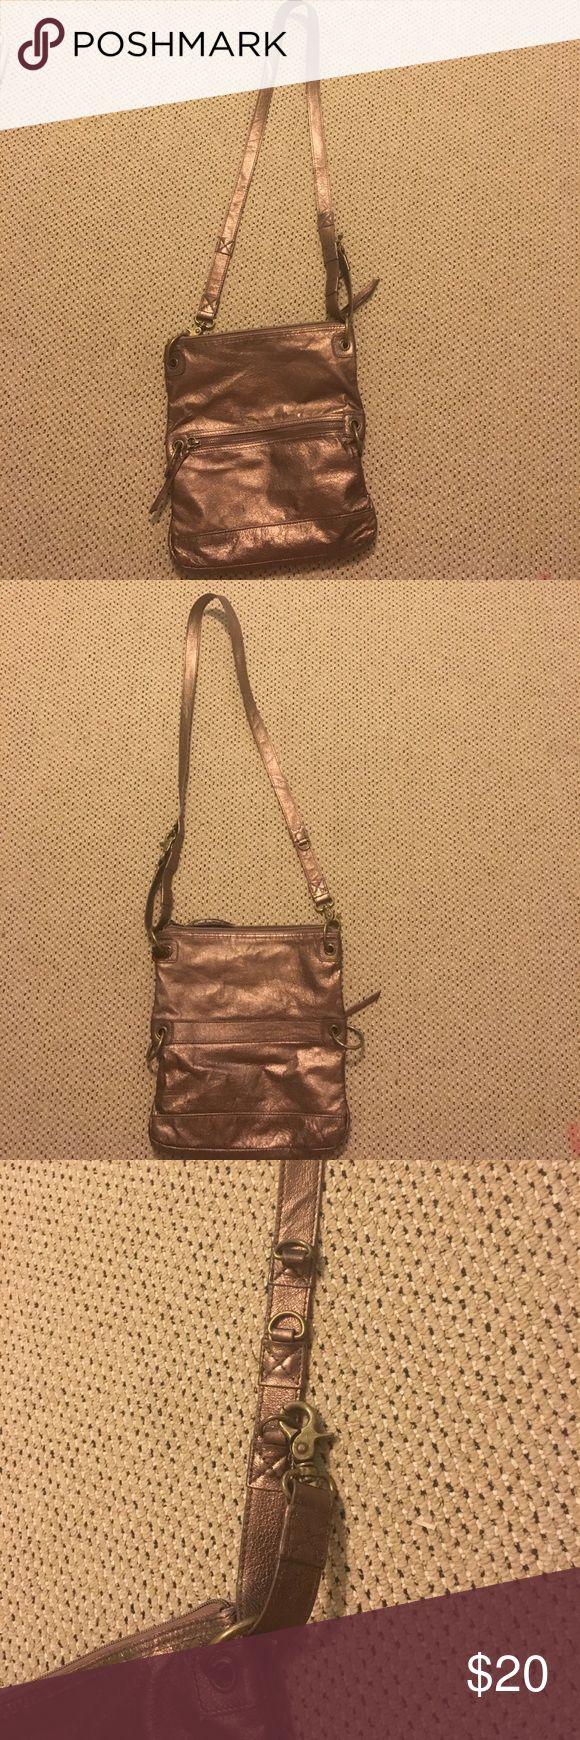 The sak crossbody metallic purse Lightly used / in good condition / adjustable strap The Sak Bags Crossbody Bags